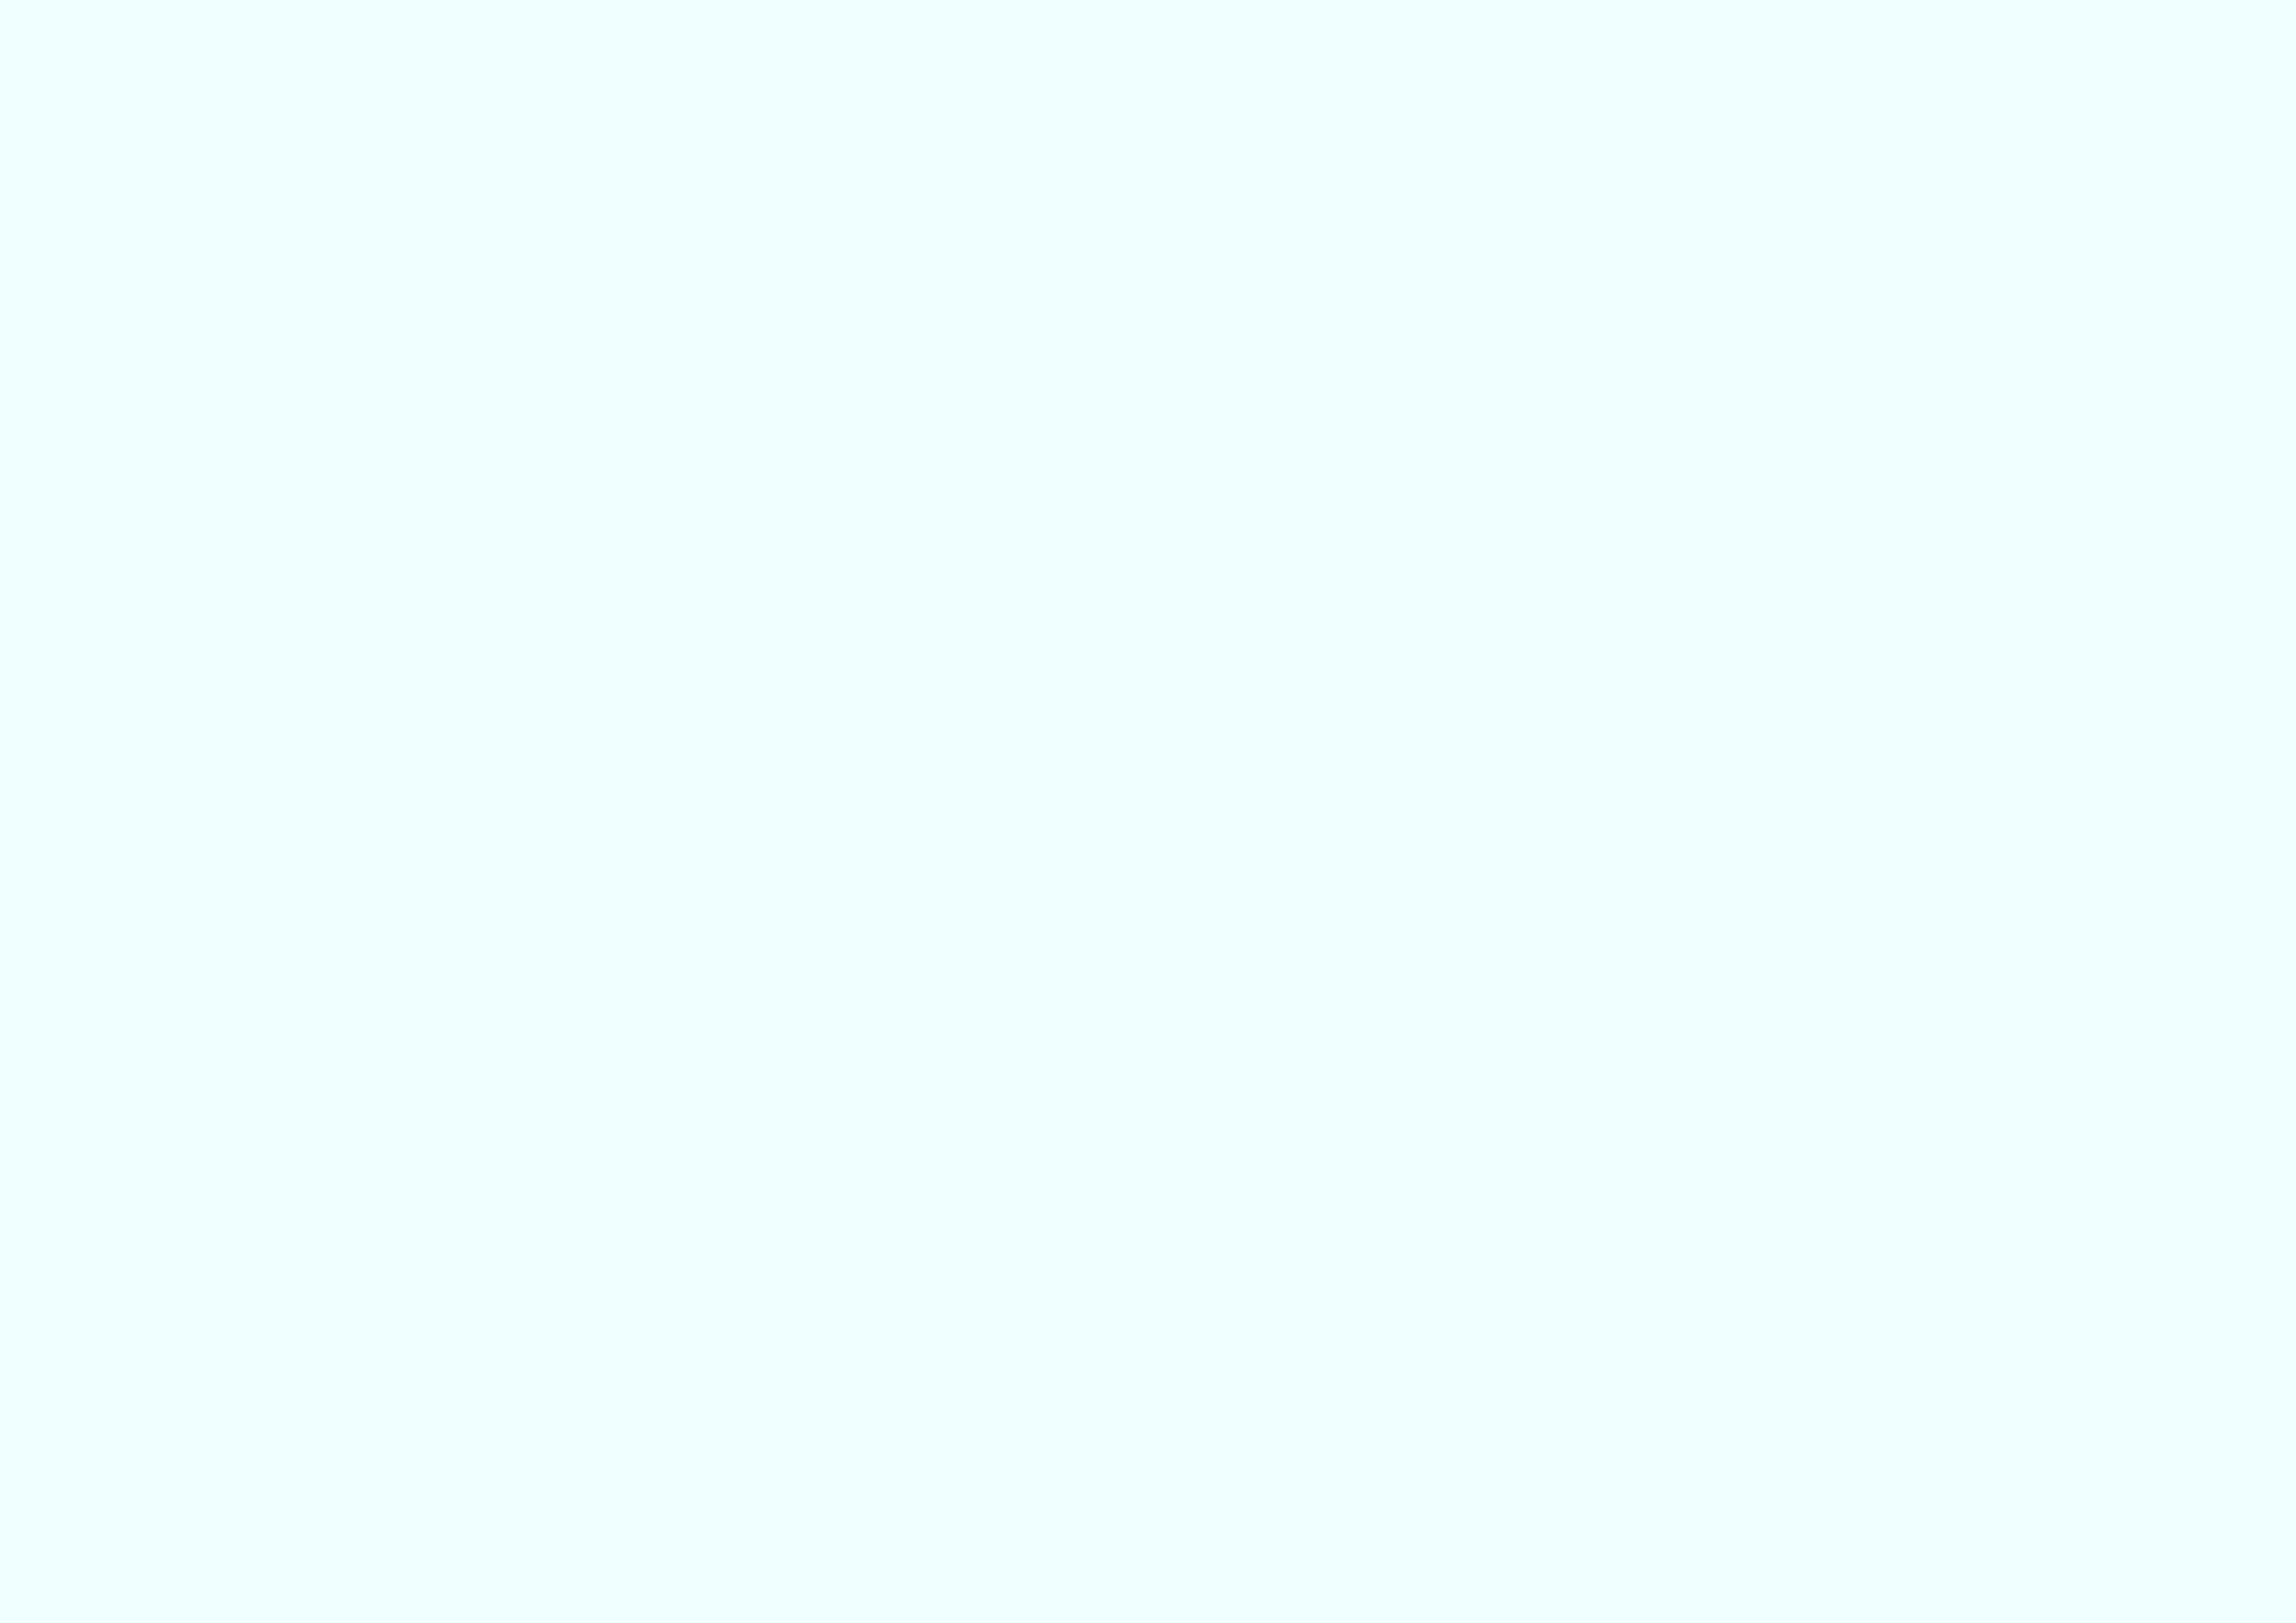 3508x2480 Azure Mist Solid Color Background